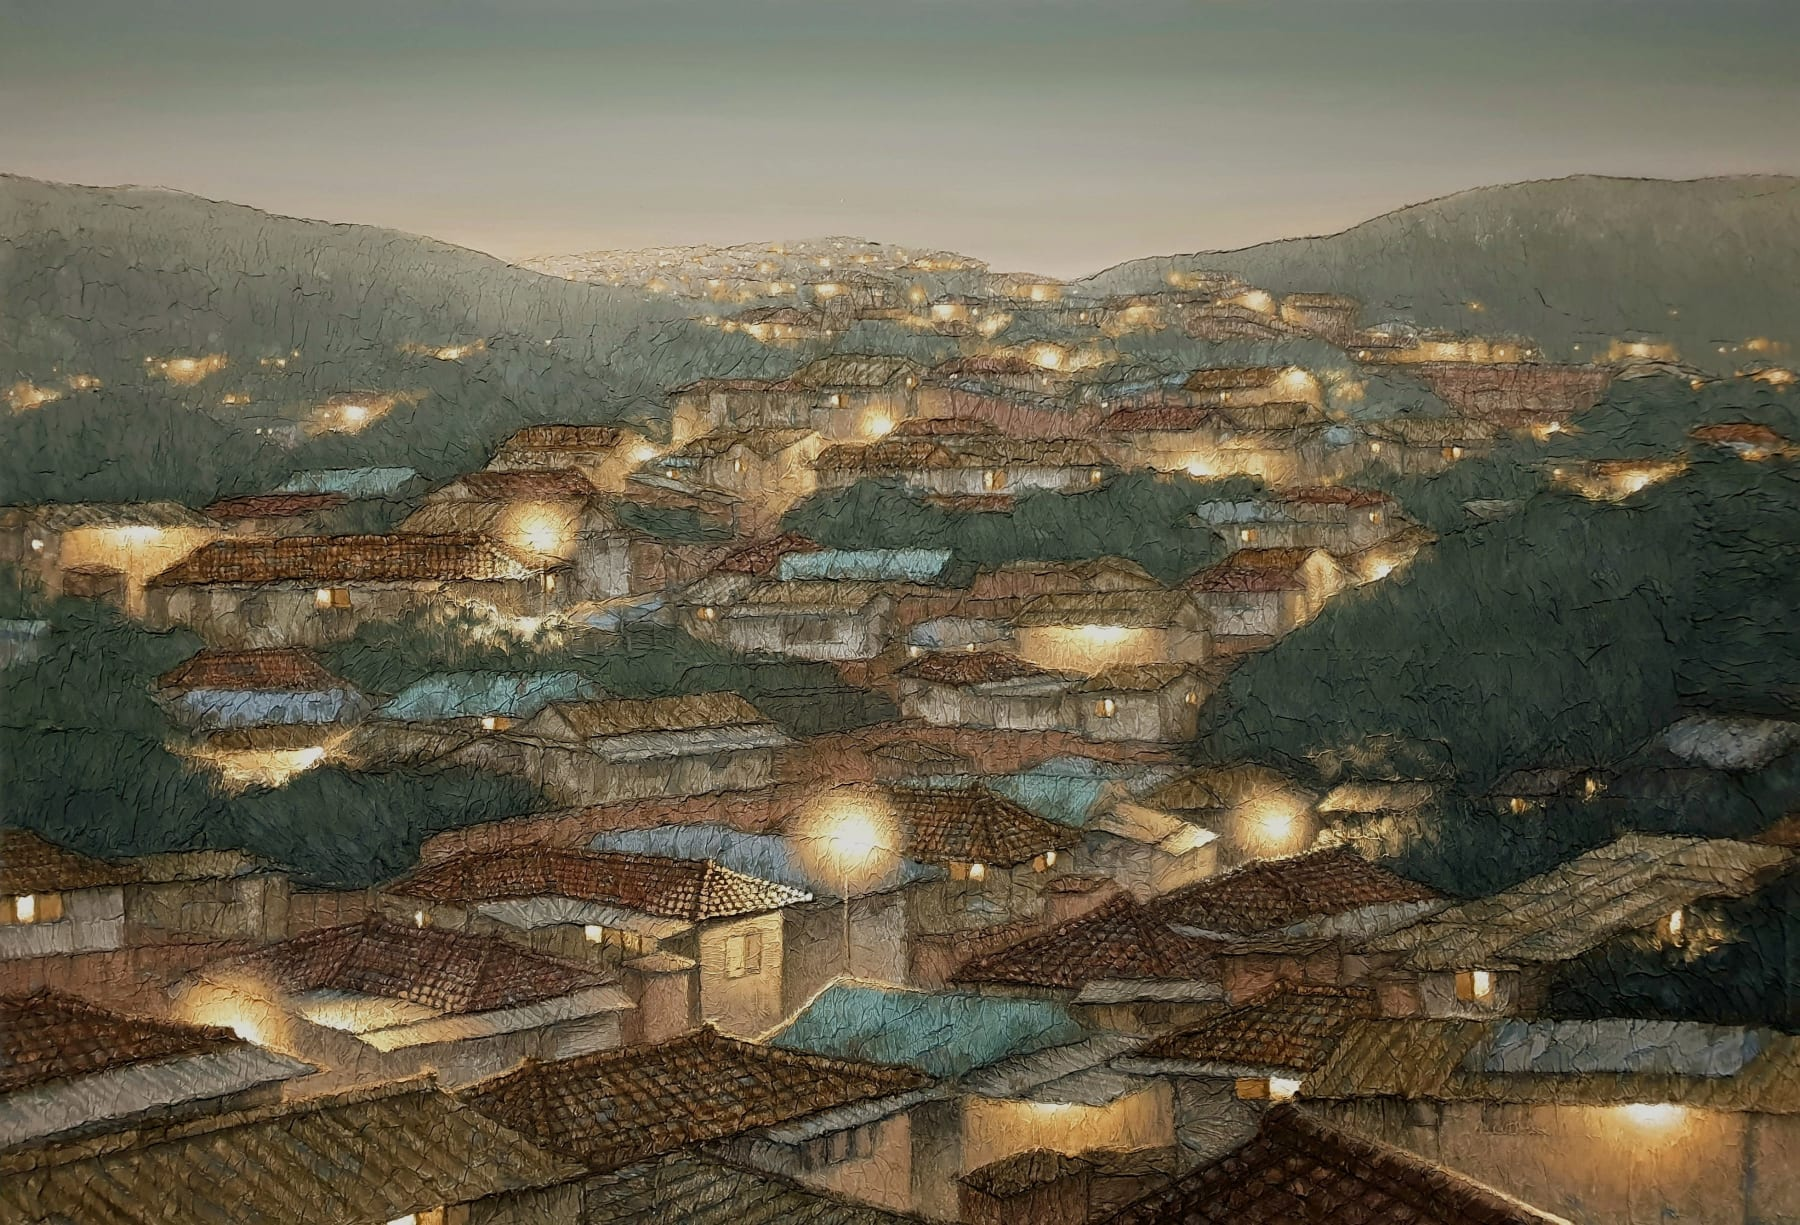 Joung Young-ju, High Hills Village, 2020